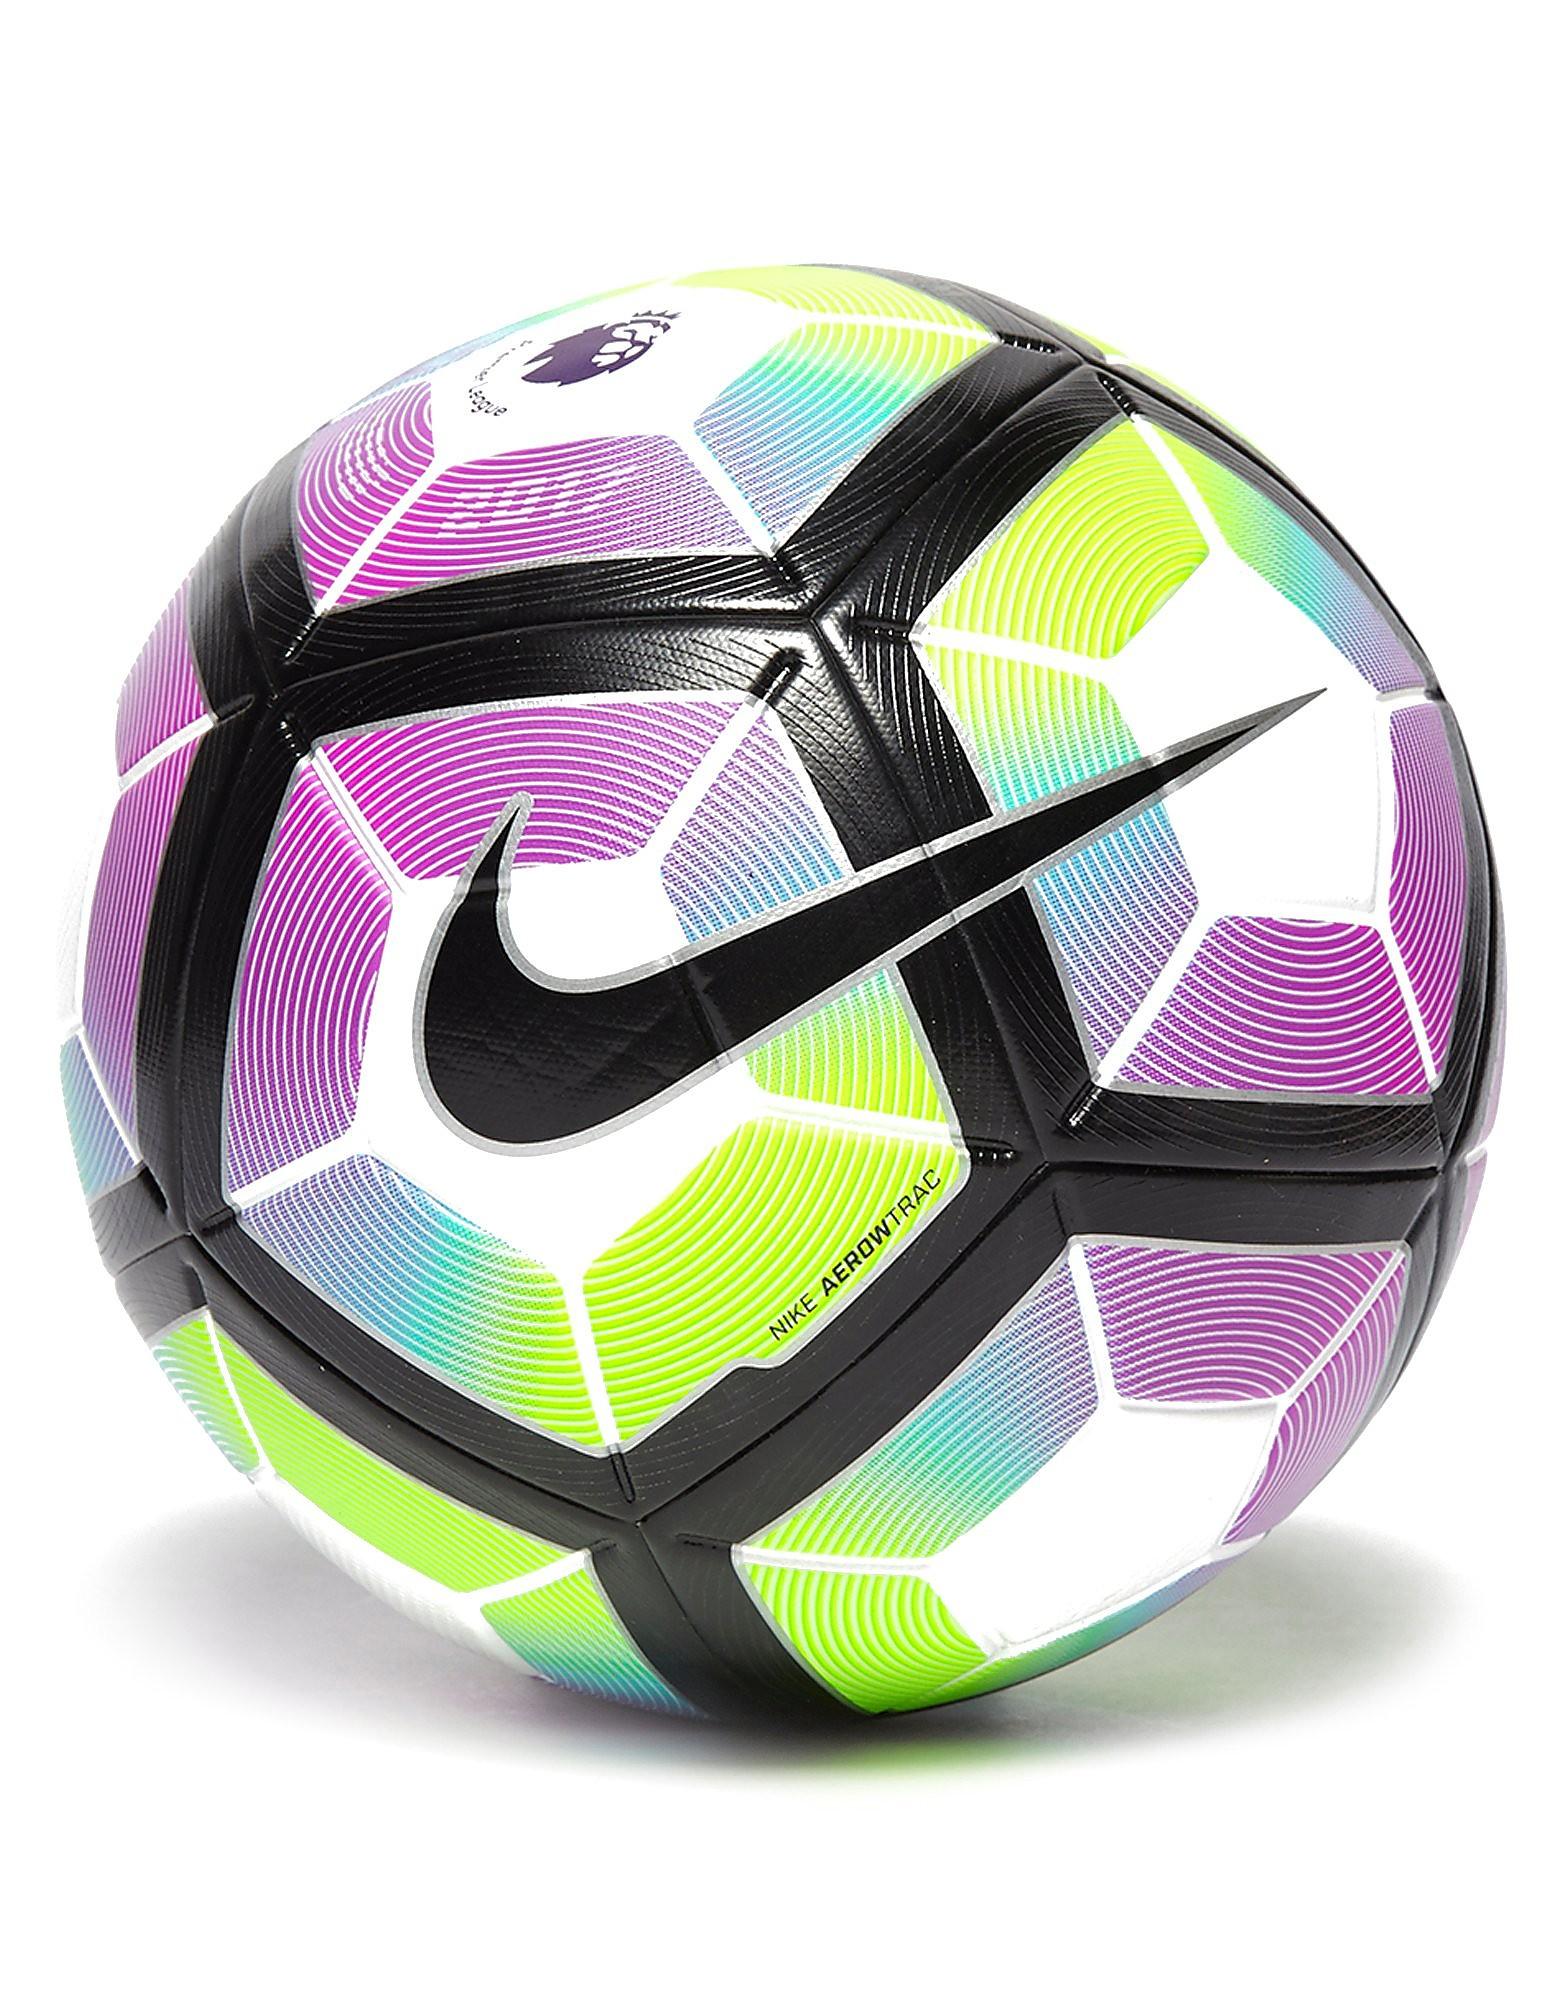 Nike Ordem 4 Premier League 2016/17 Football